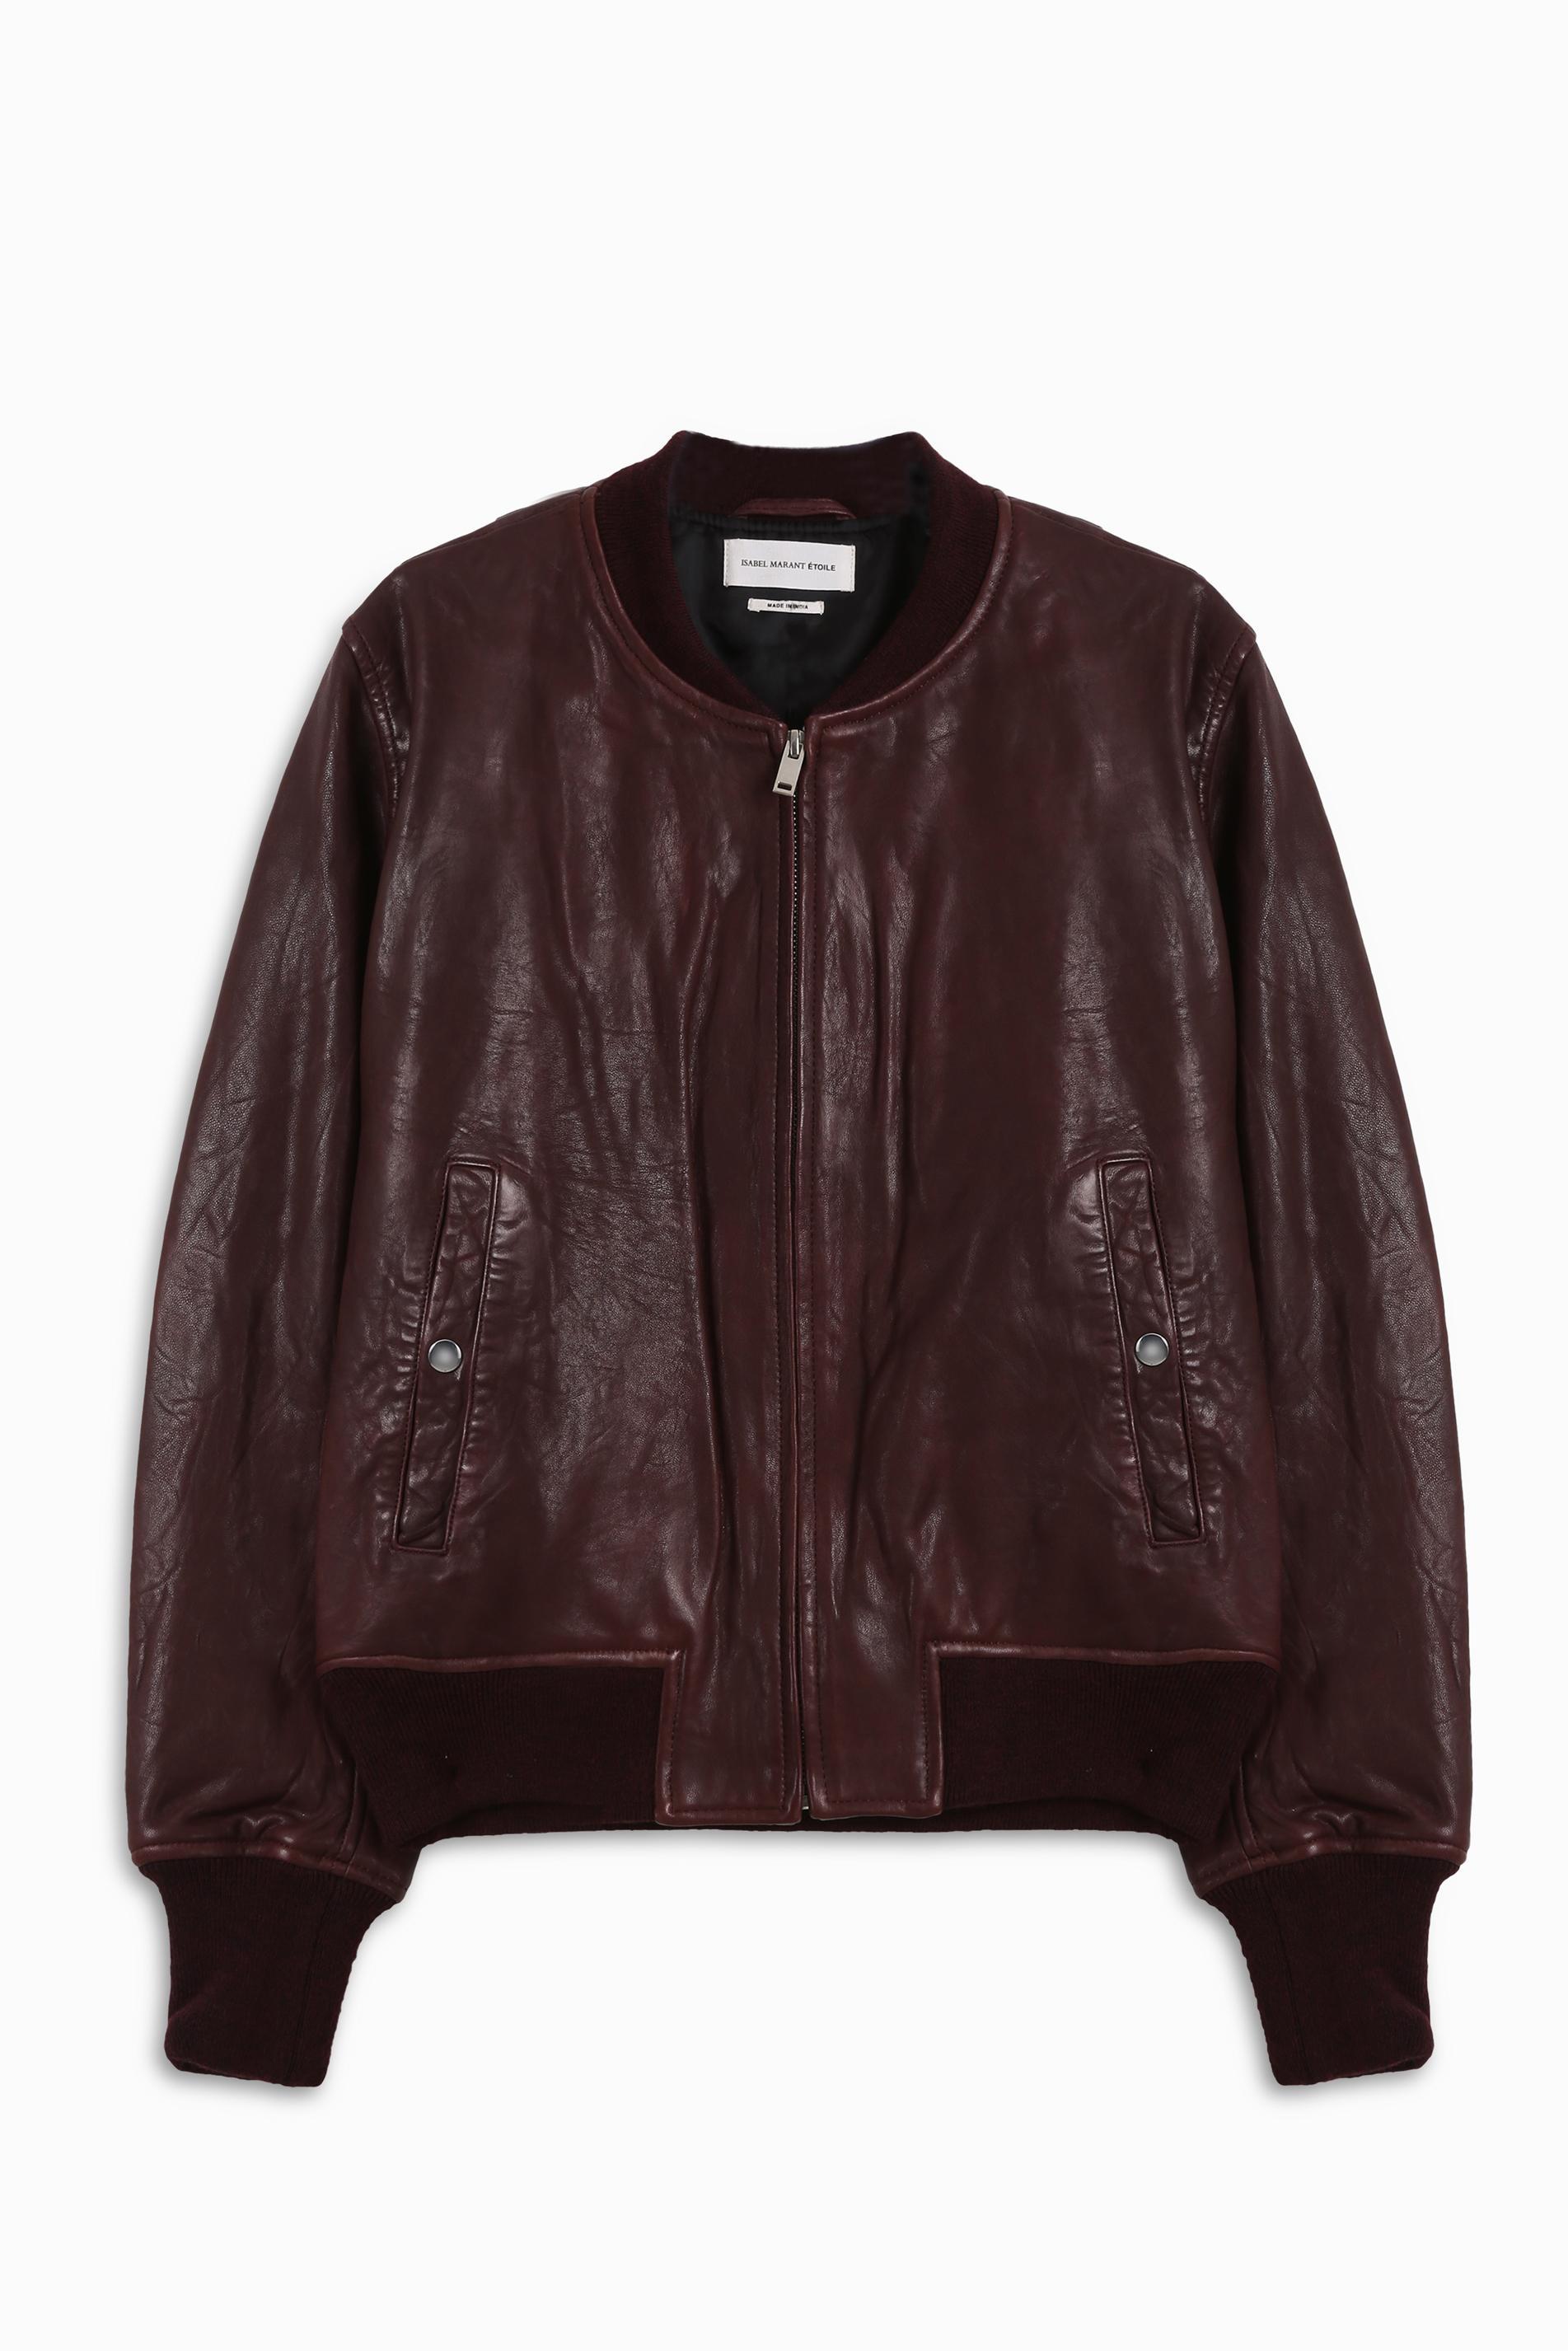 feab18443 Étoile Isabel Marant Red Brantley Leather Bomber Jacket